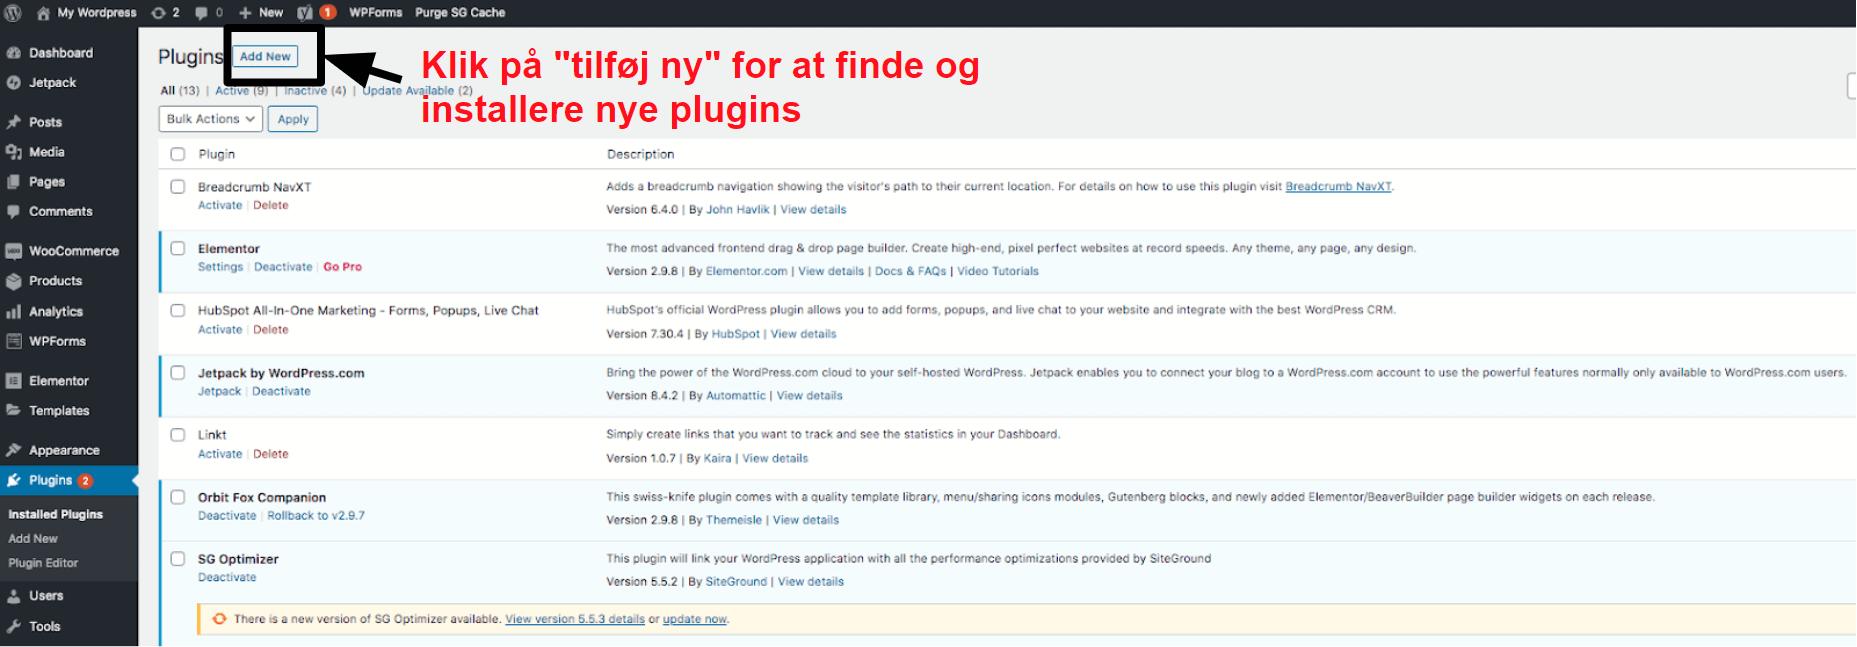 manage your installed plugins in WordPress DA19